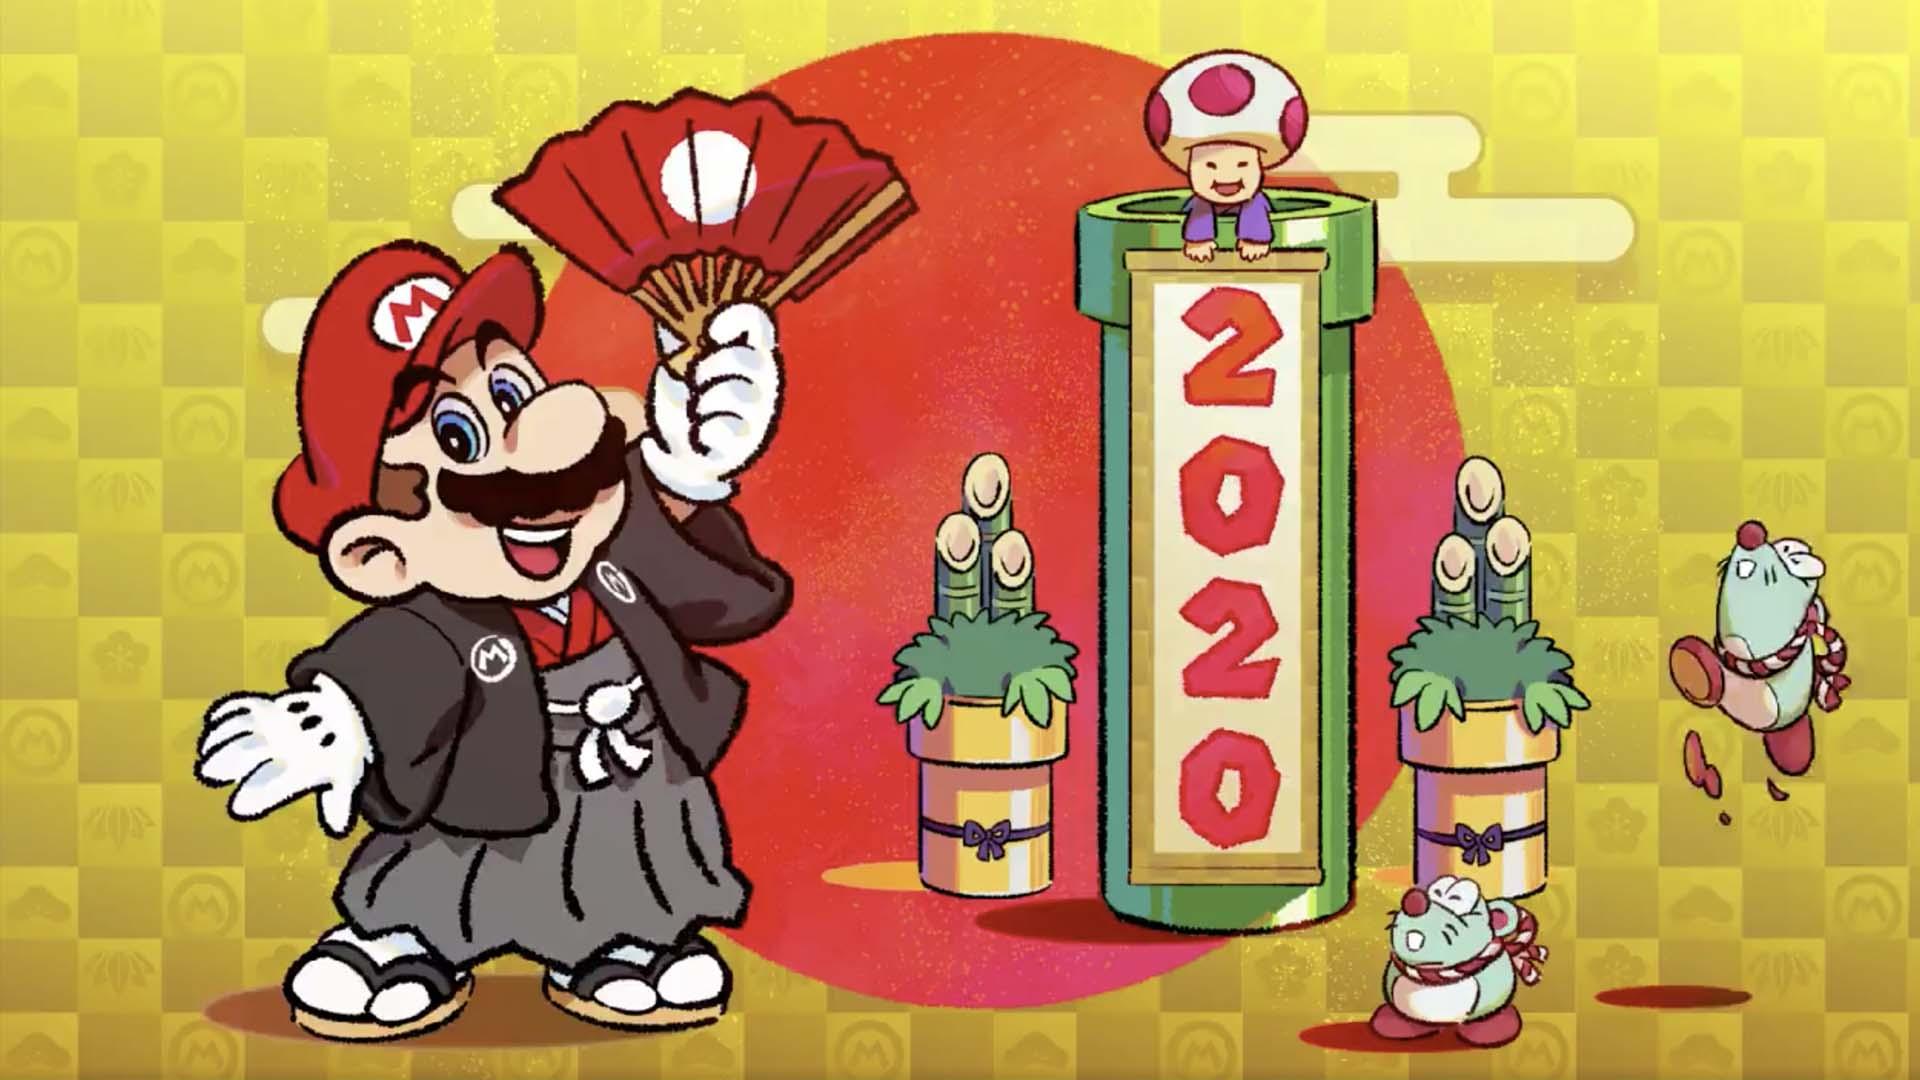 Buon 2020 da Nintendo!